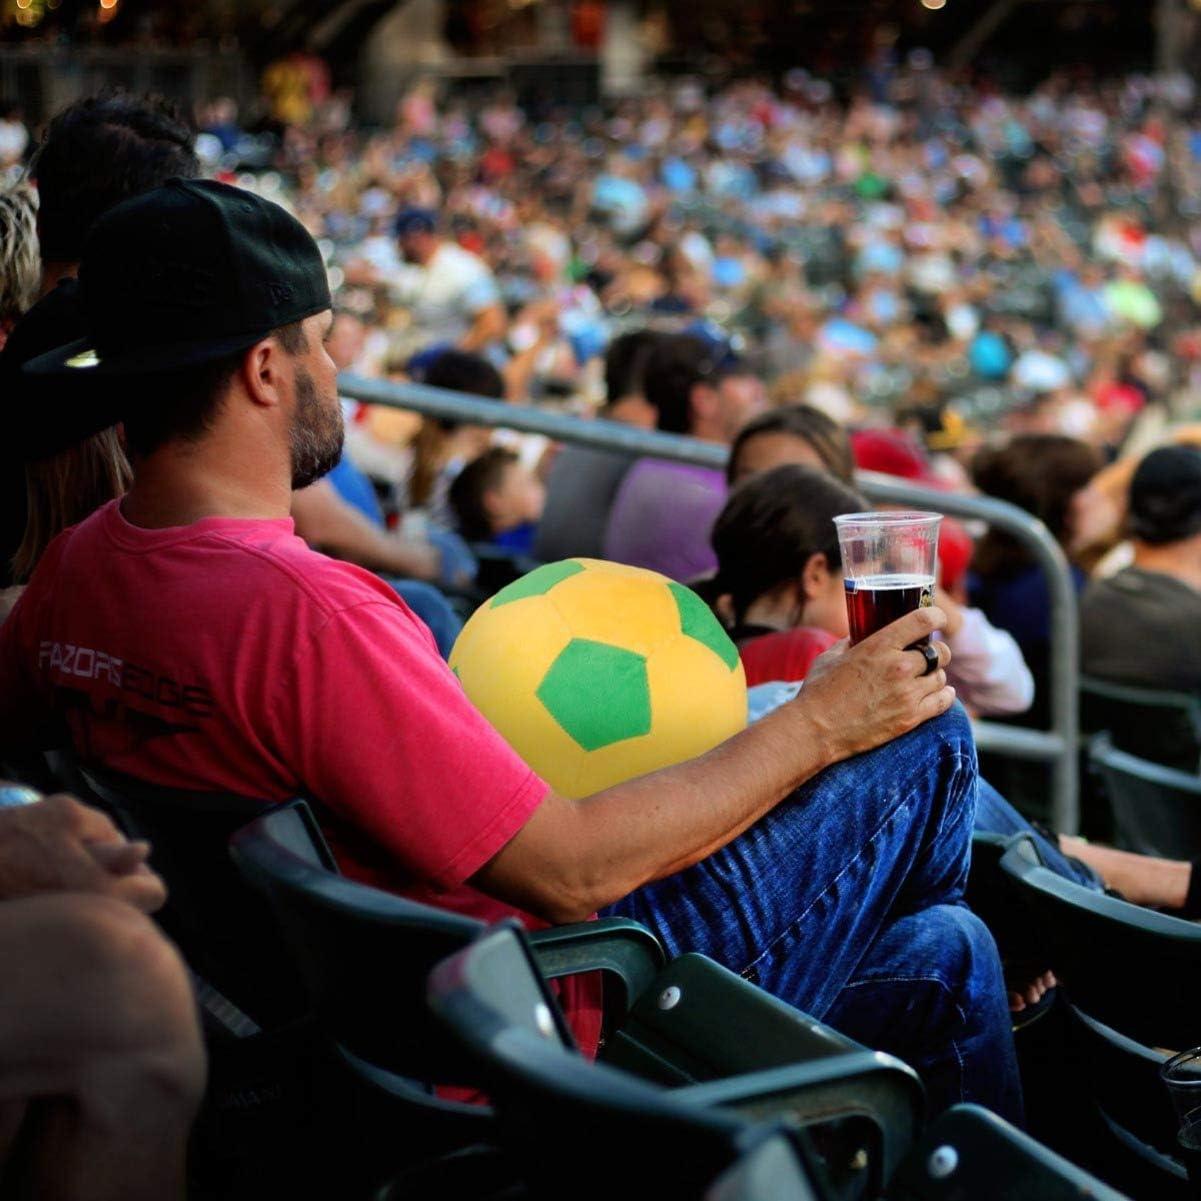 Toyvian Pelota de F/útbol de Felpa Juguetes de F/útbol Blandos Pelota de Deportes Divertida Regalo de Juguete de F/útbol para Fan/ático del F/útbol Ni/ños Ni/ño Ni/ño Copa Mundial Suministros para Fiestas